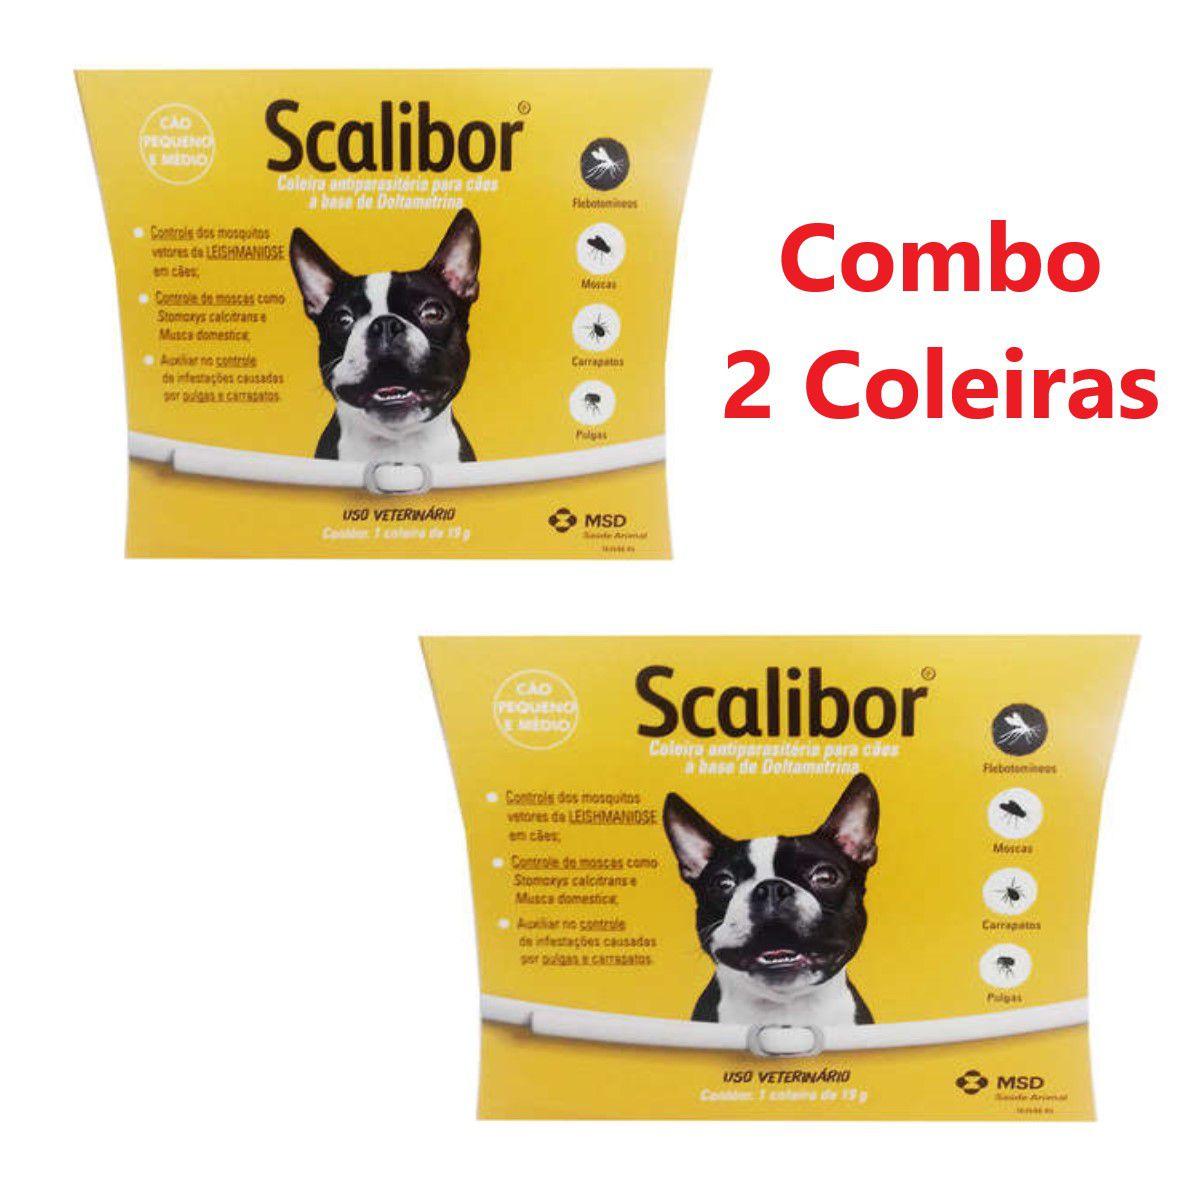 Combo 2 Coleiras Scalibor Leishmaniose Antipulgas - Pequena/Medio 48cm